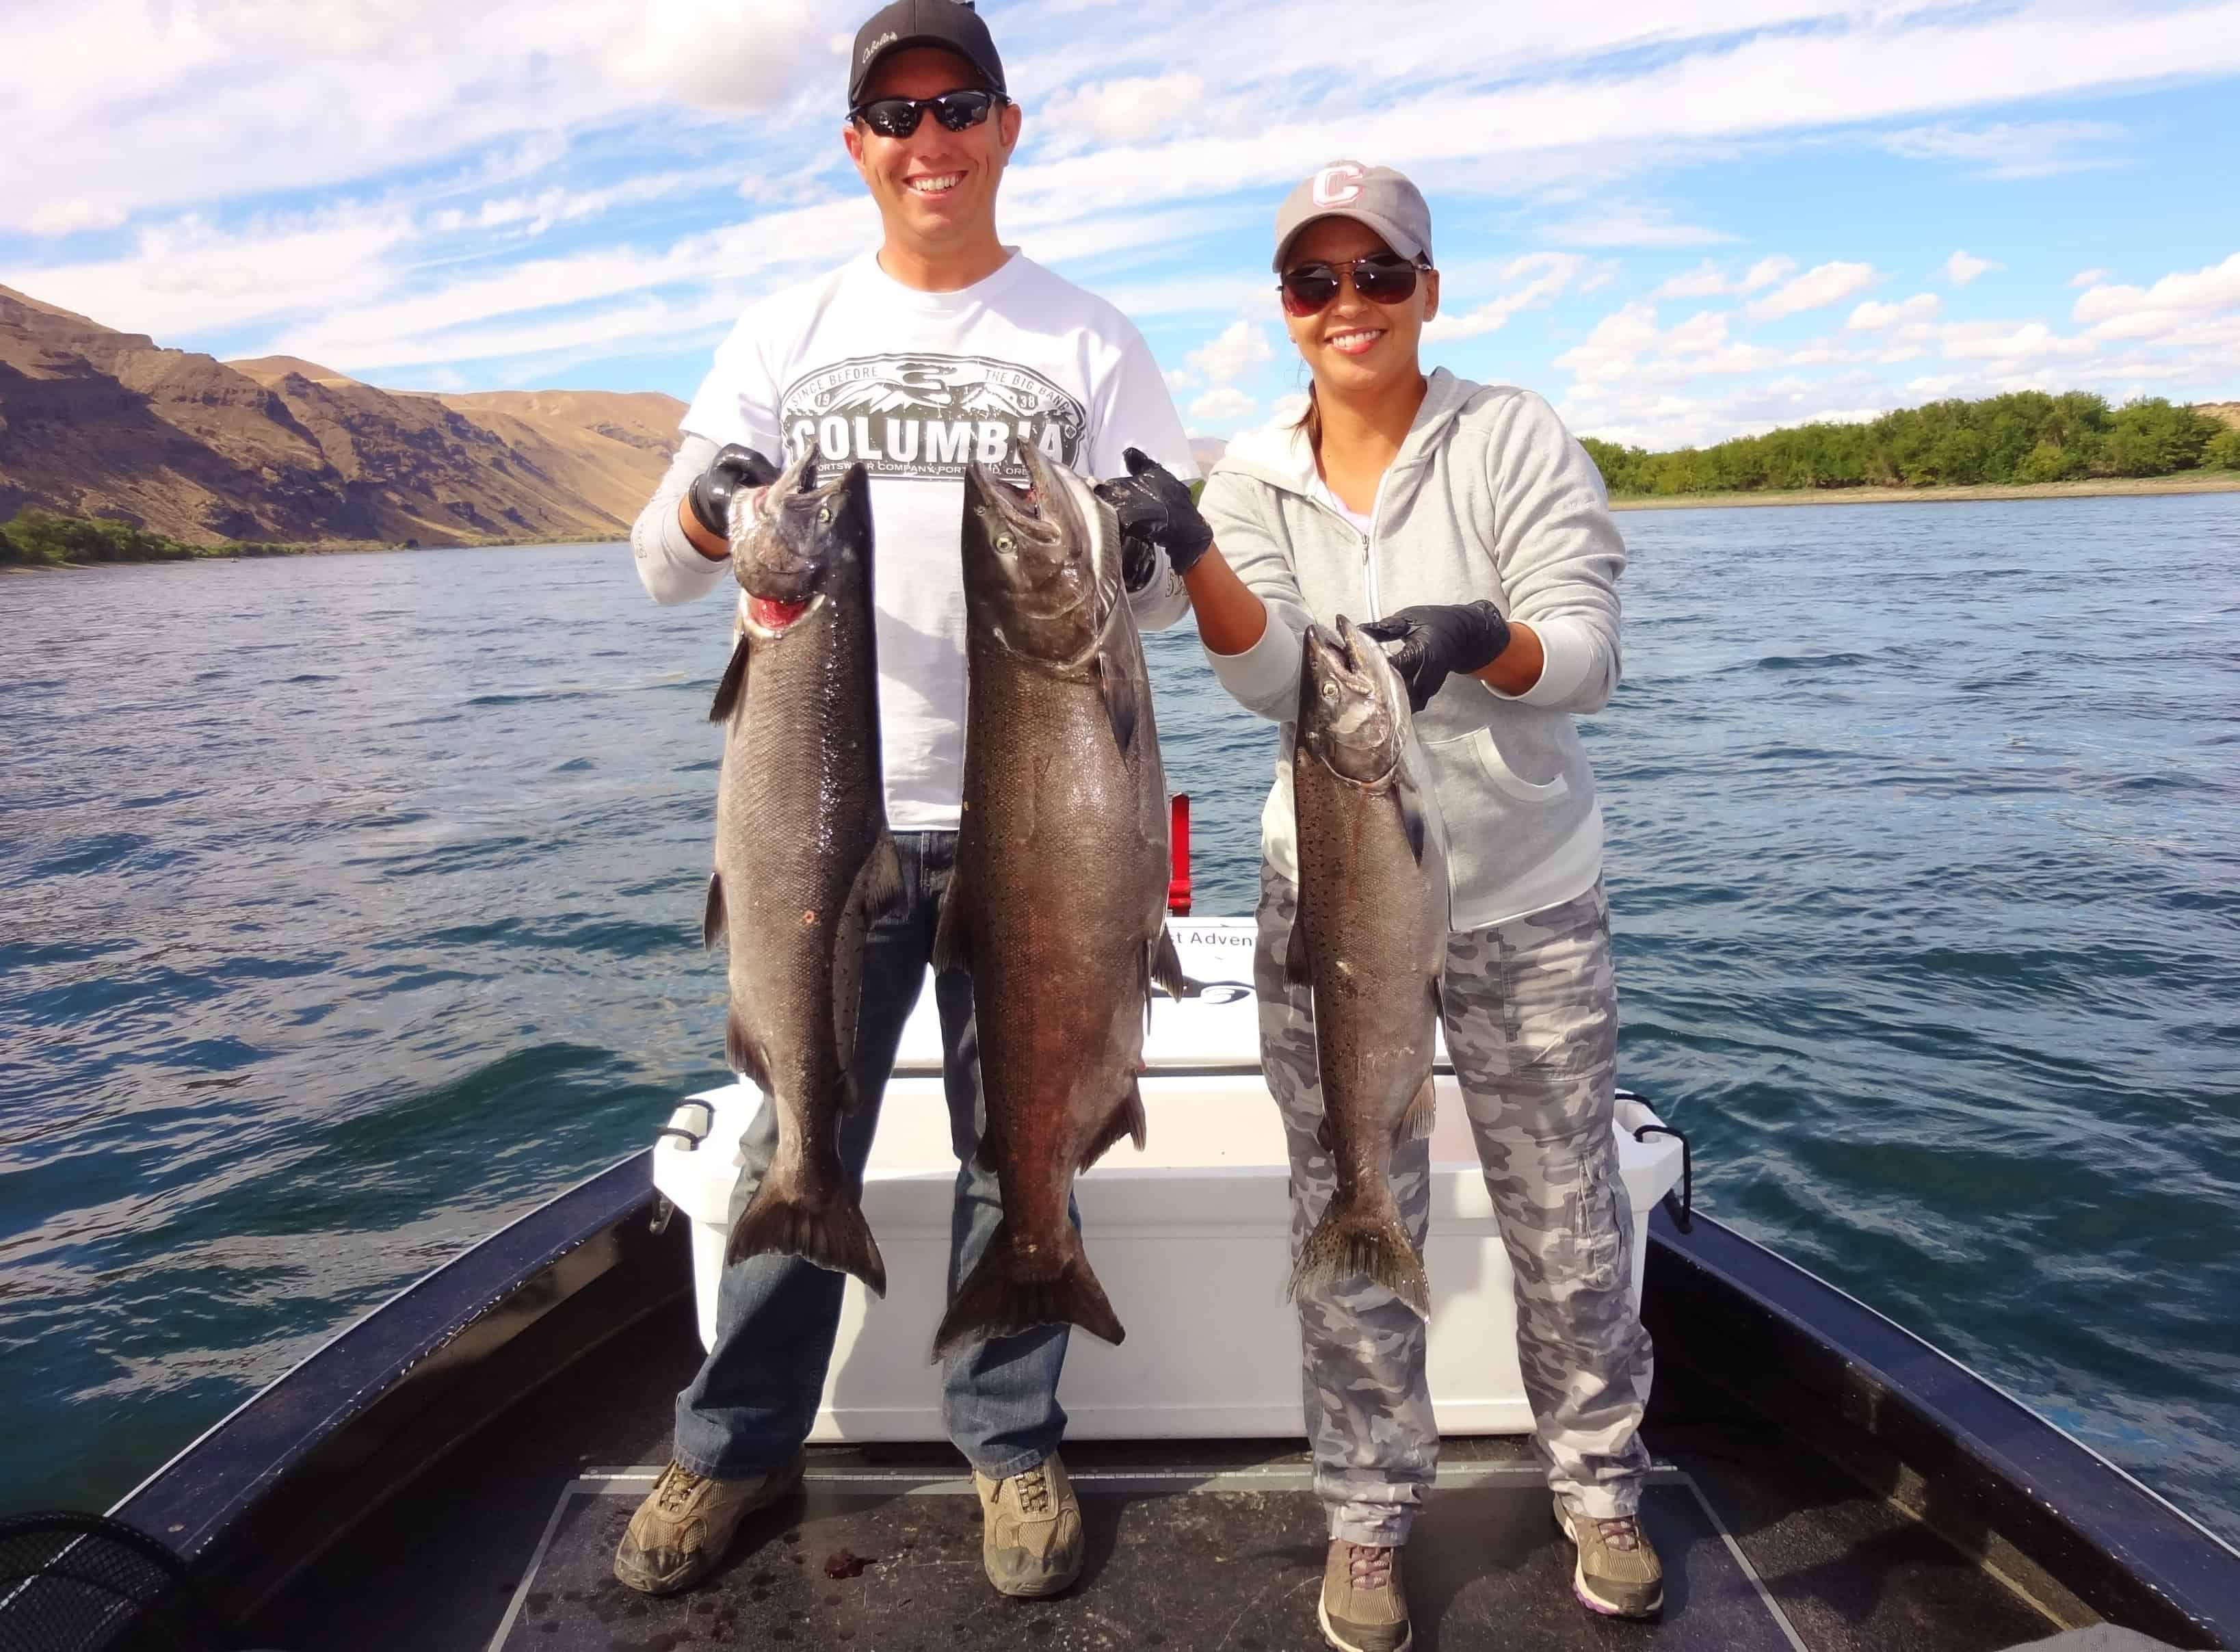 Salmon fishing the columbia river washington state usa for Salmon fishing washington